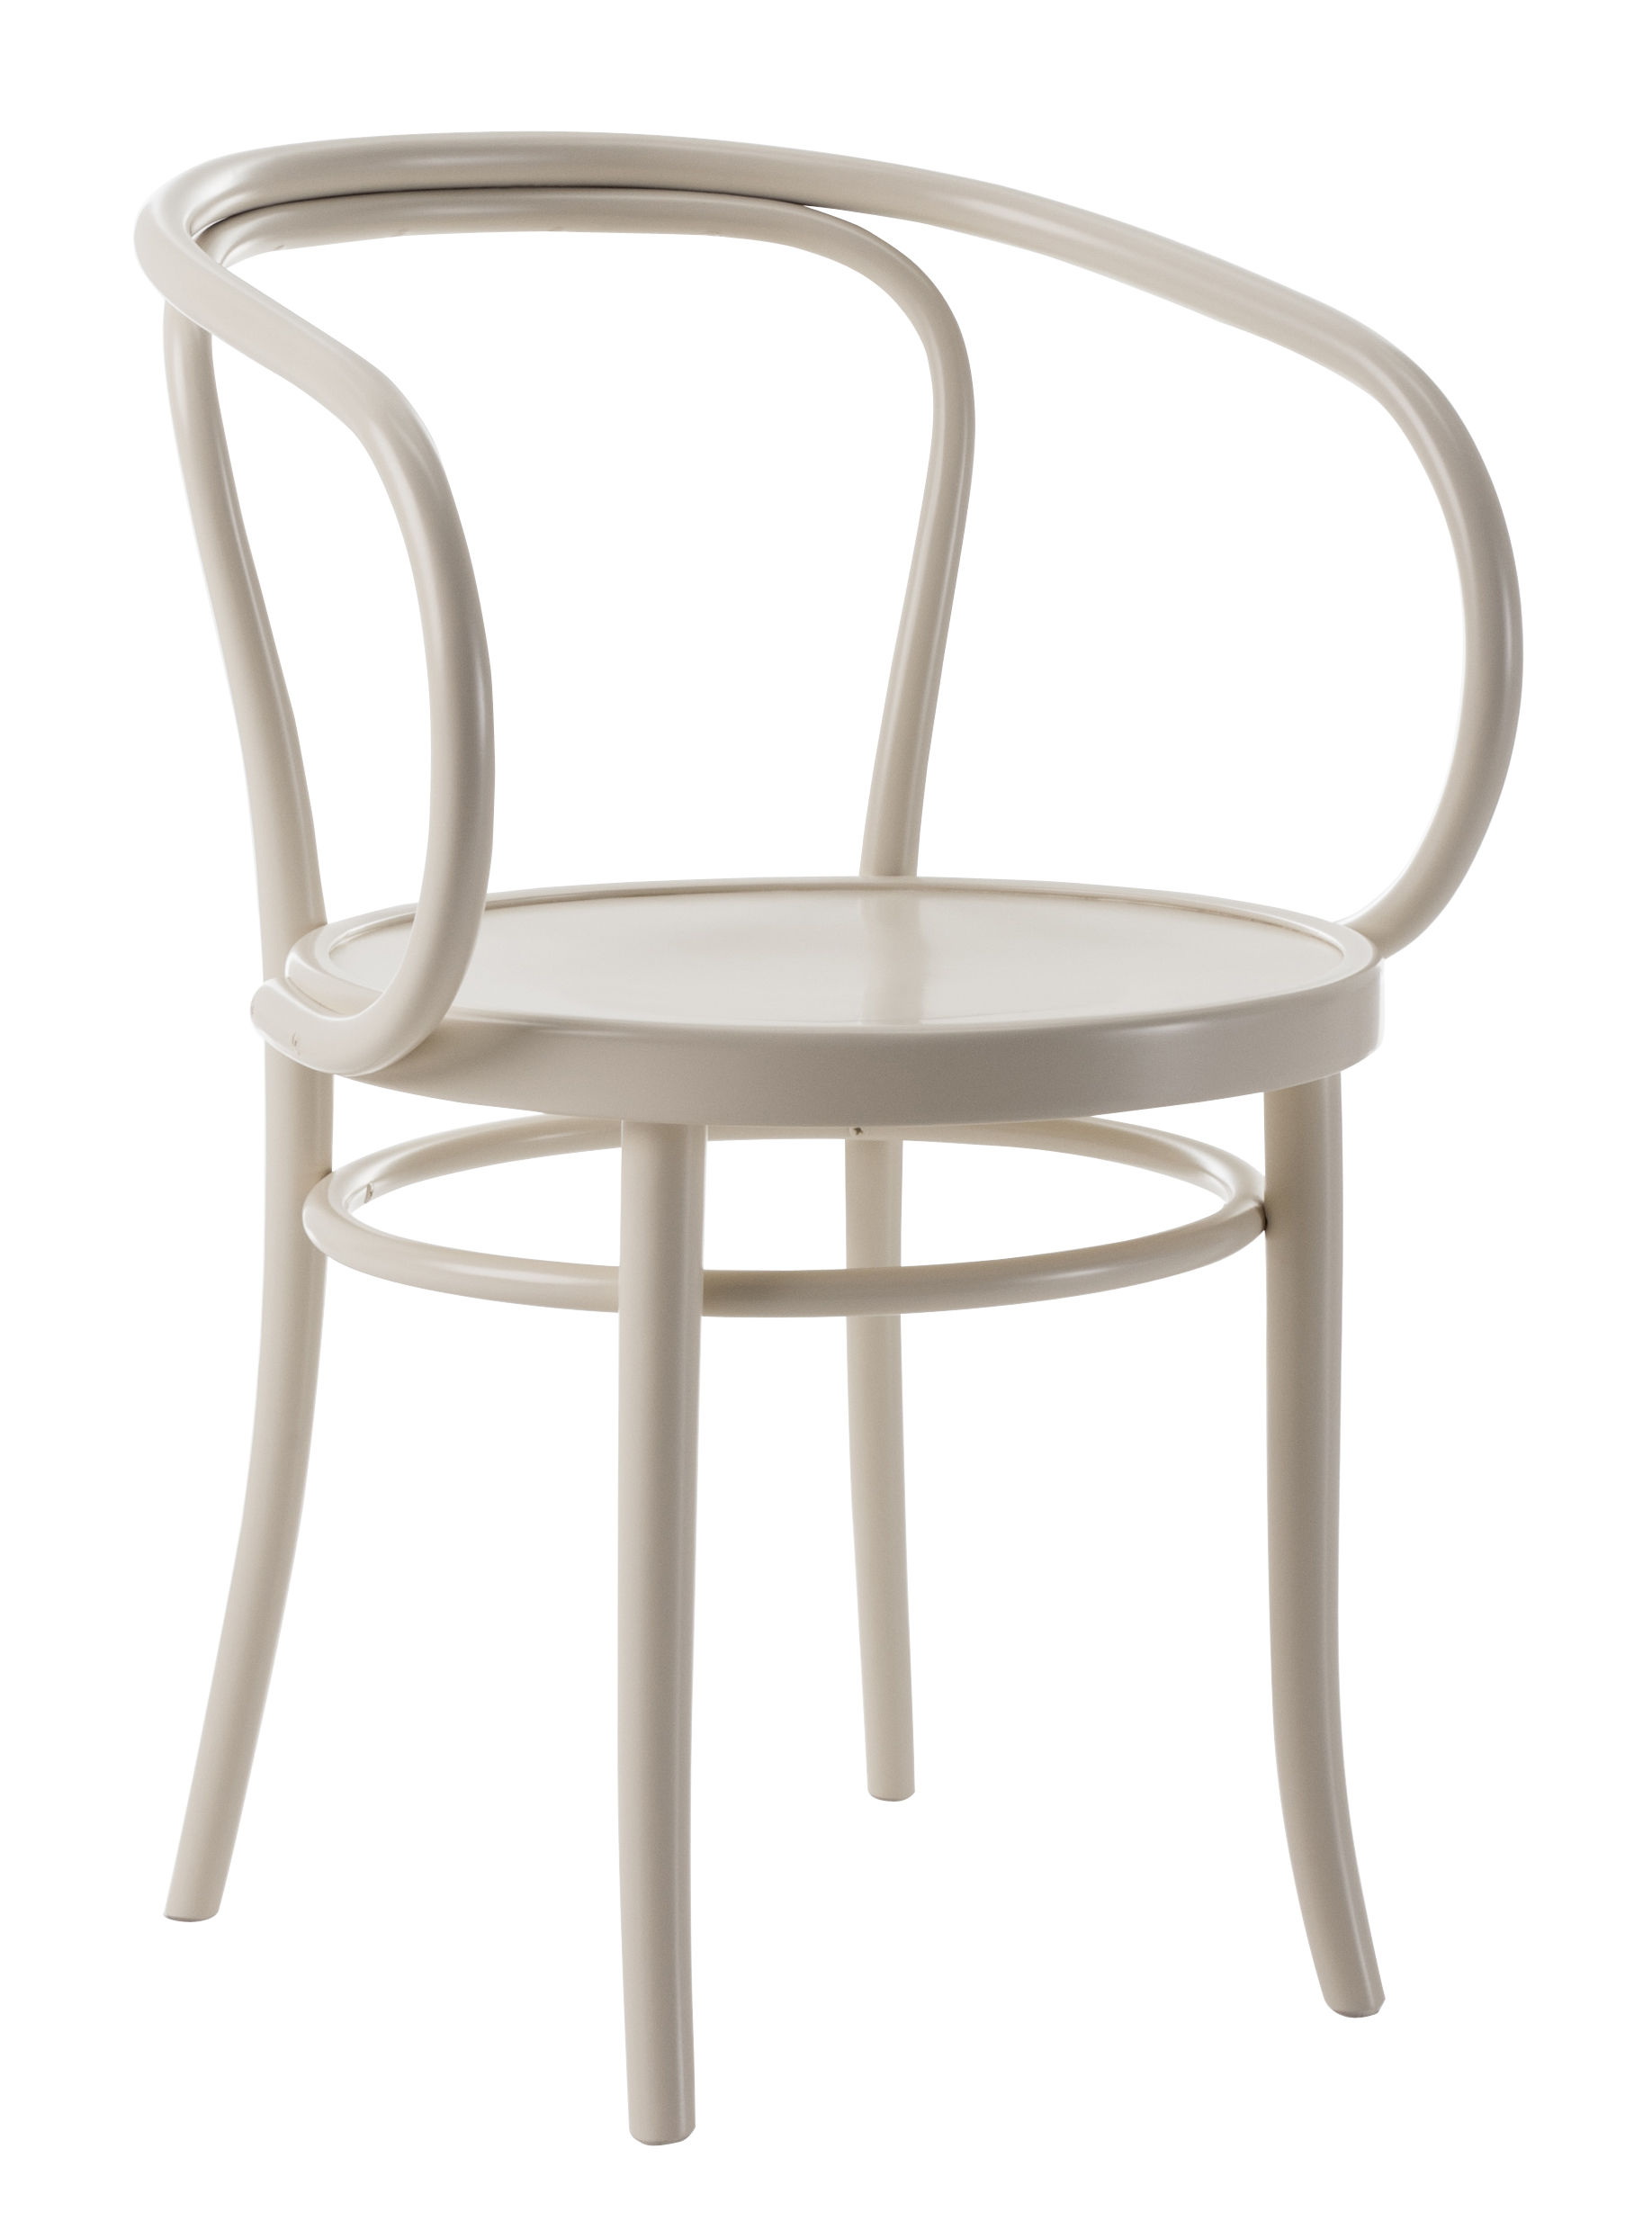 Furniture - Chairs - Wiener Stuhl Armchair - / Full seat - 1904 reissue by Wiener GTV Design - White - Beechwood plywood, Curved solid beechwood